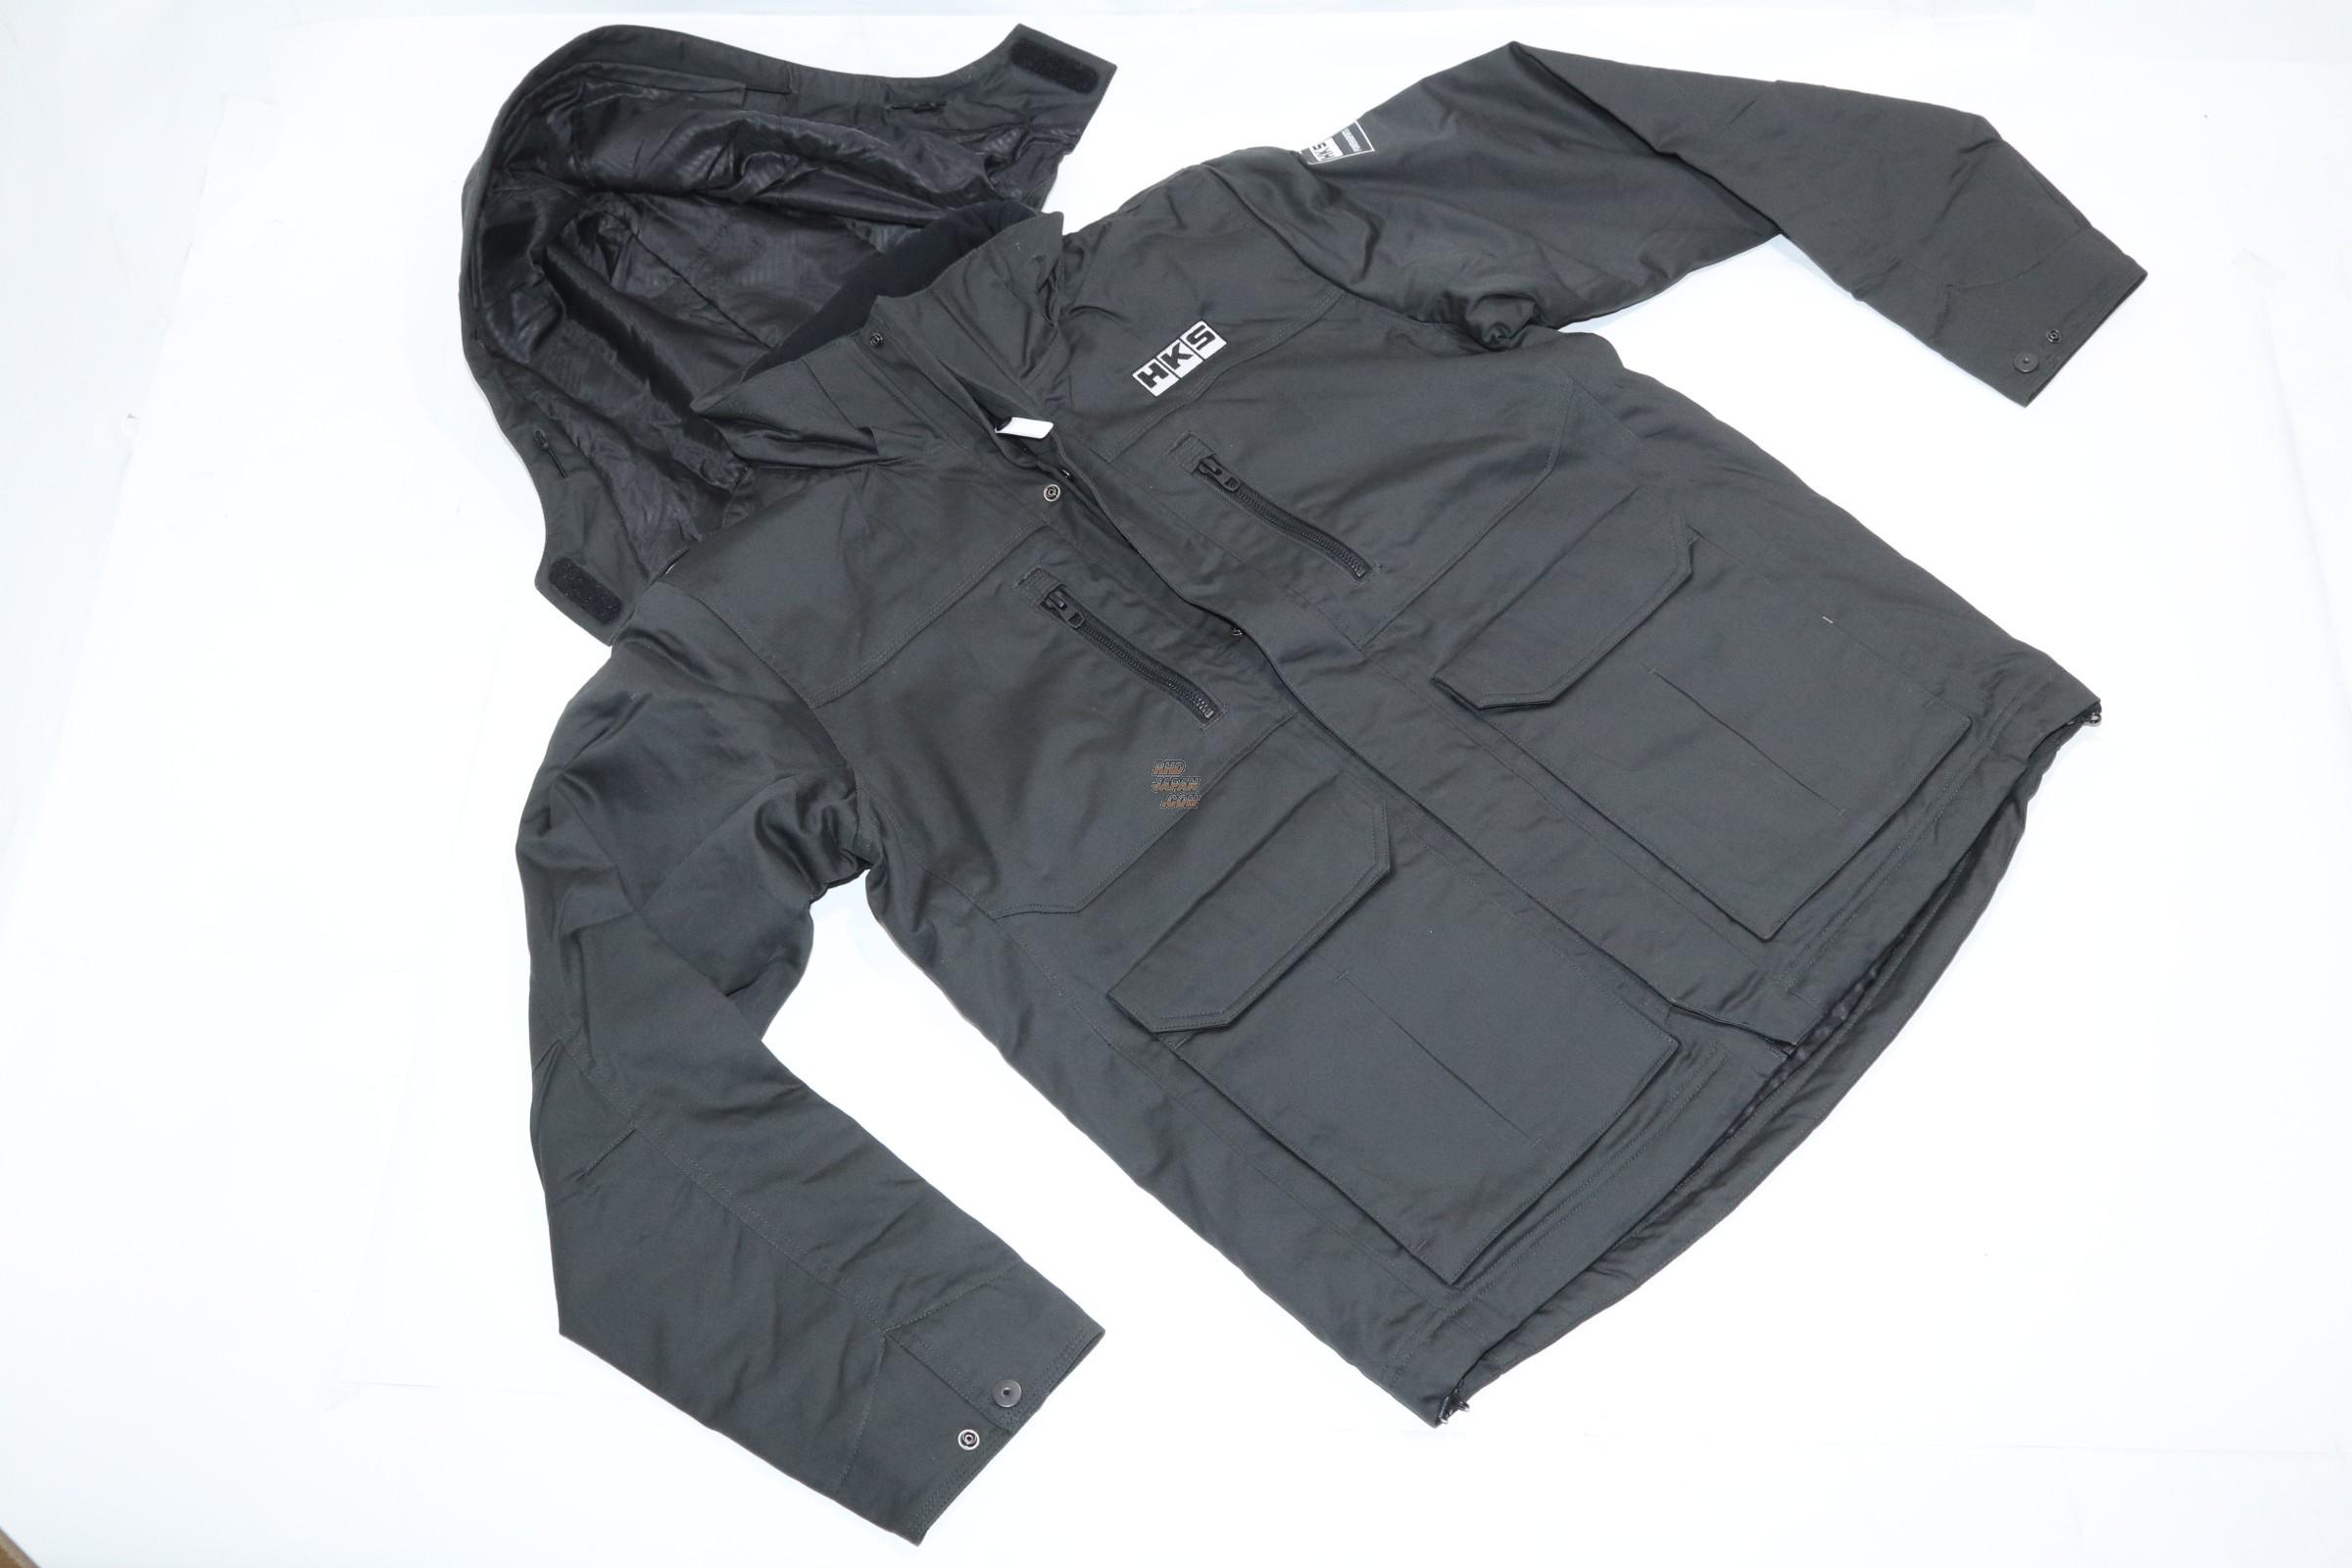 HKS Warm Jacket Limited Edition - 4L